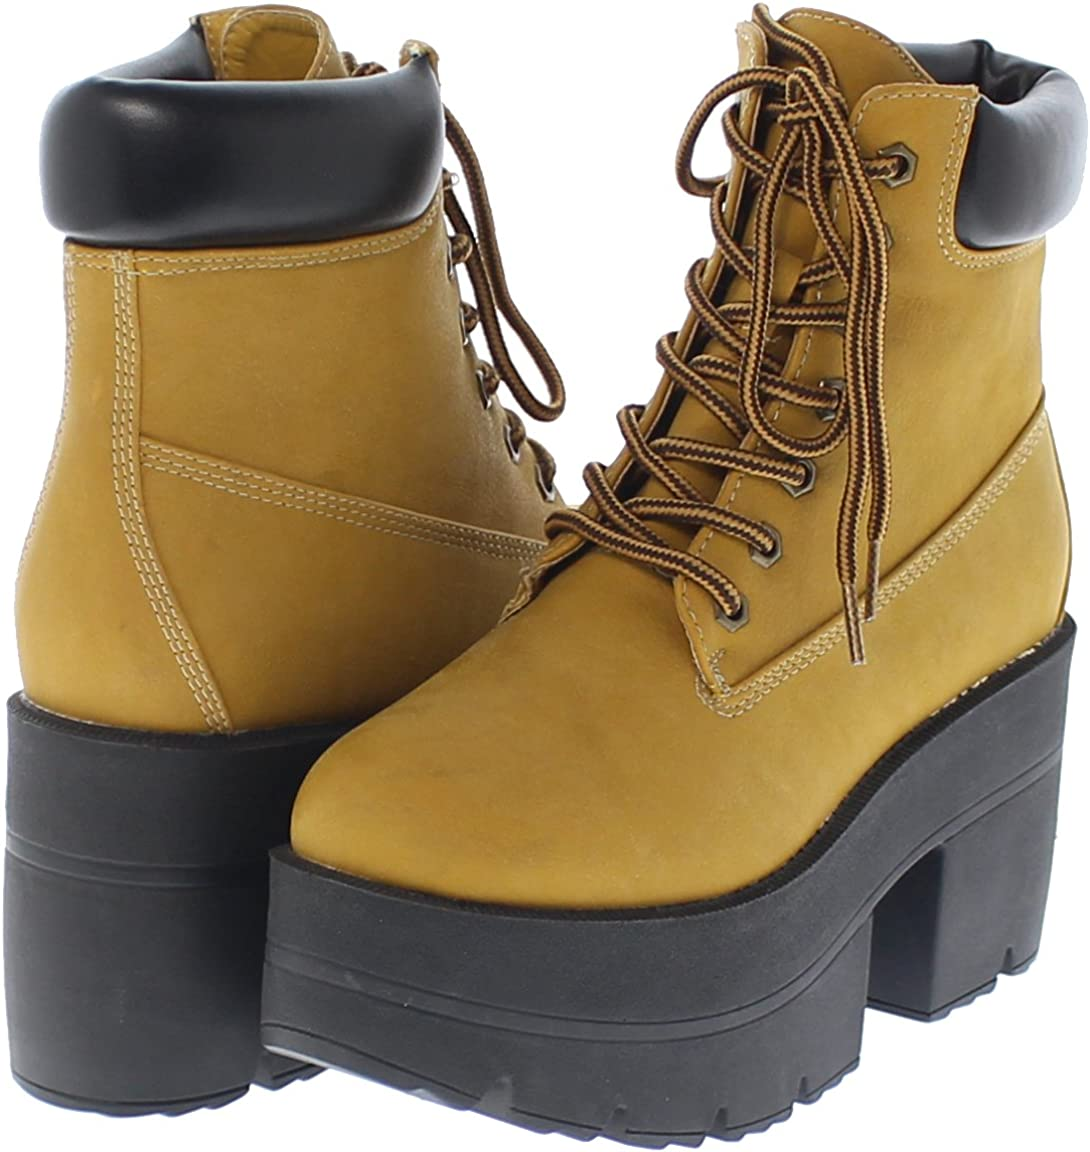 Shoe Republic Chunky Platform Lace